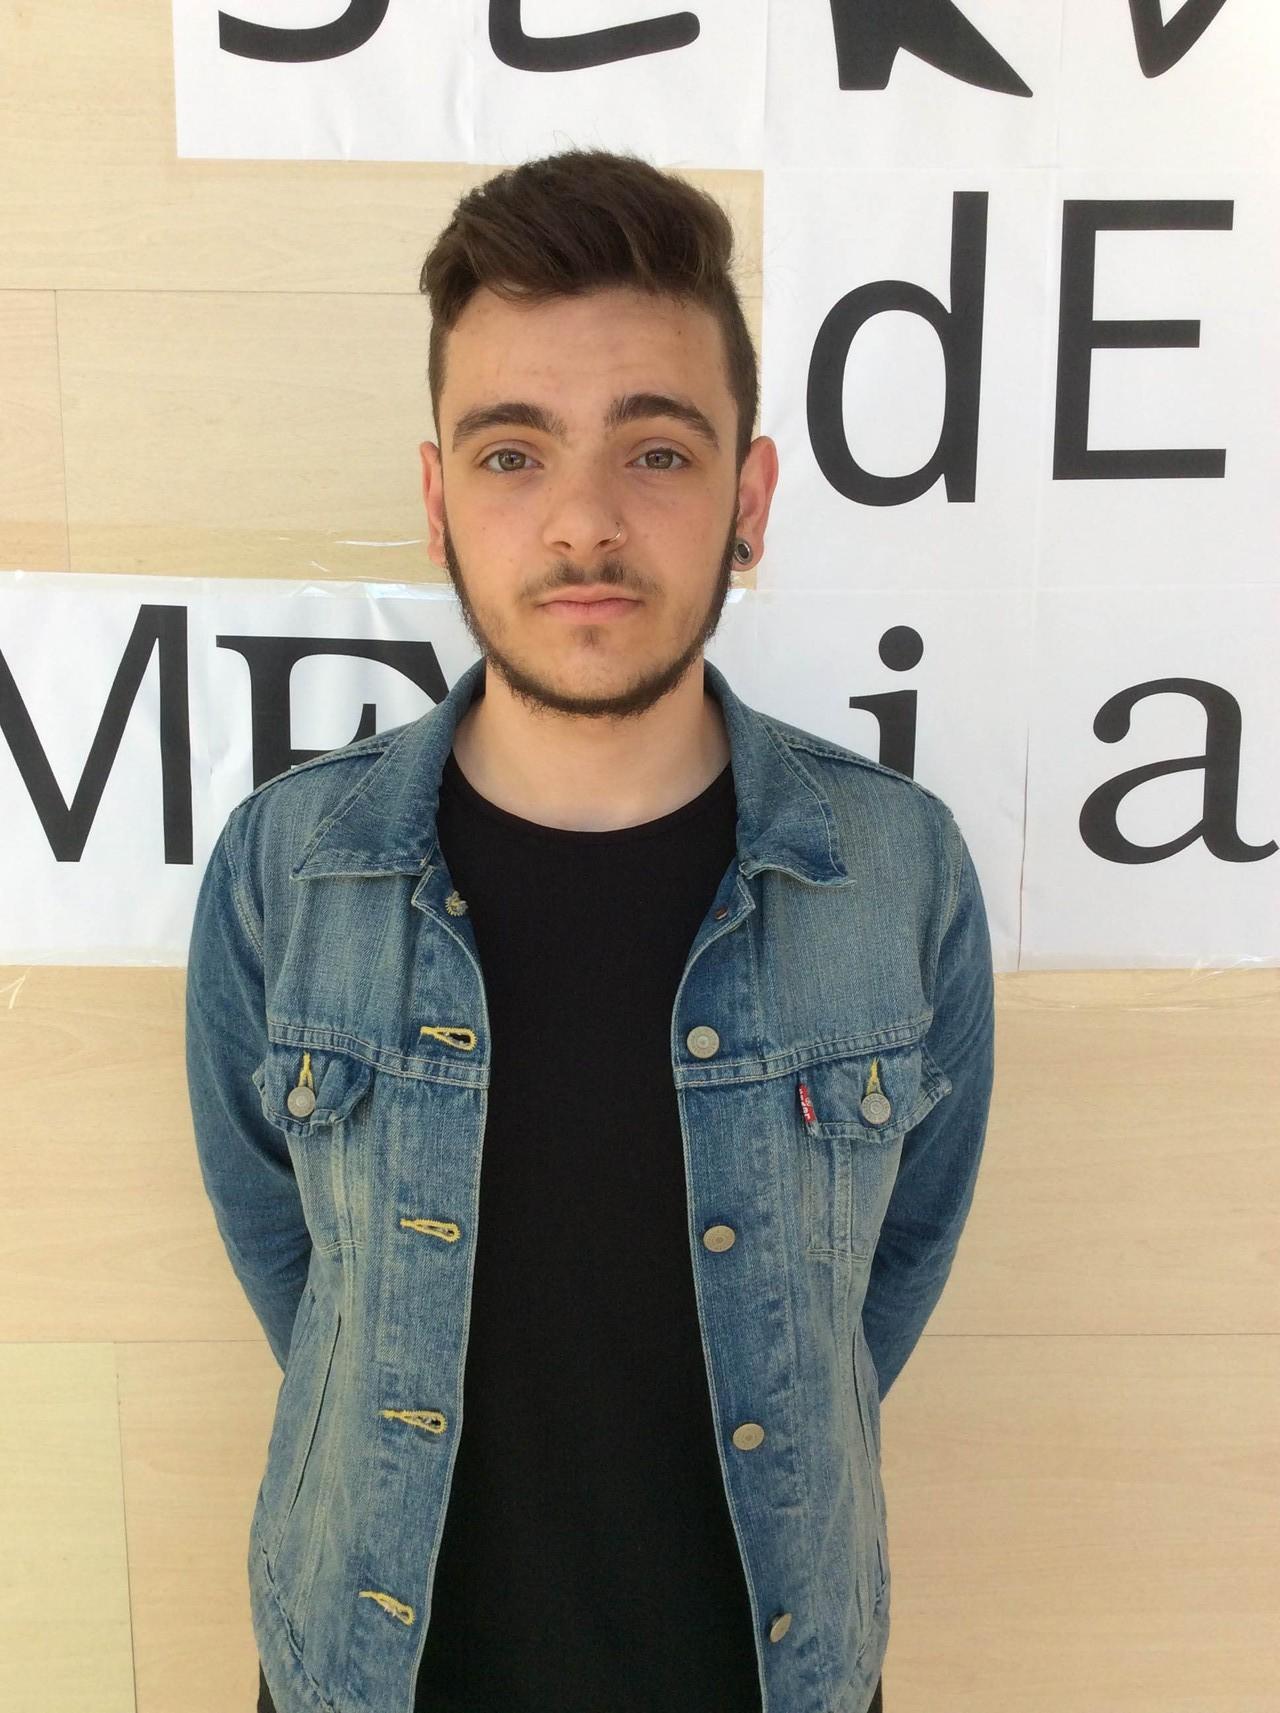 Alumne guanyador: Adrià Fernández